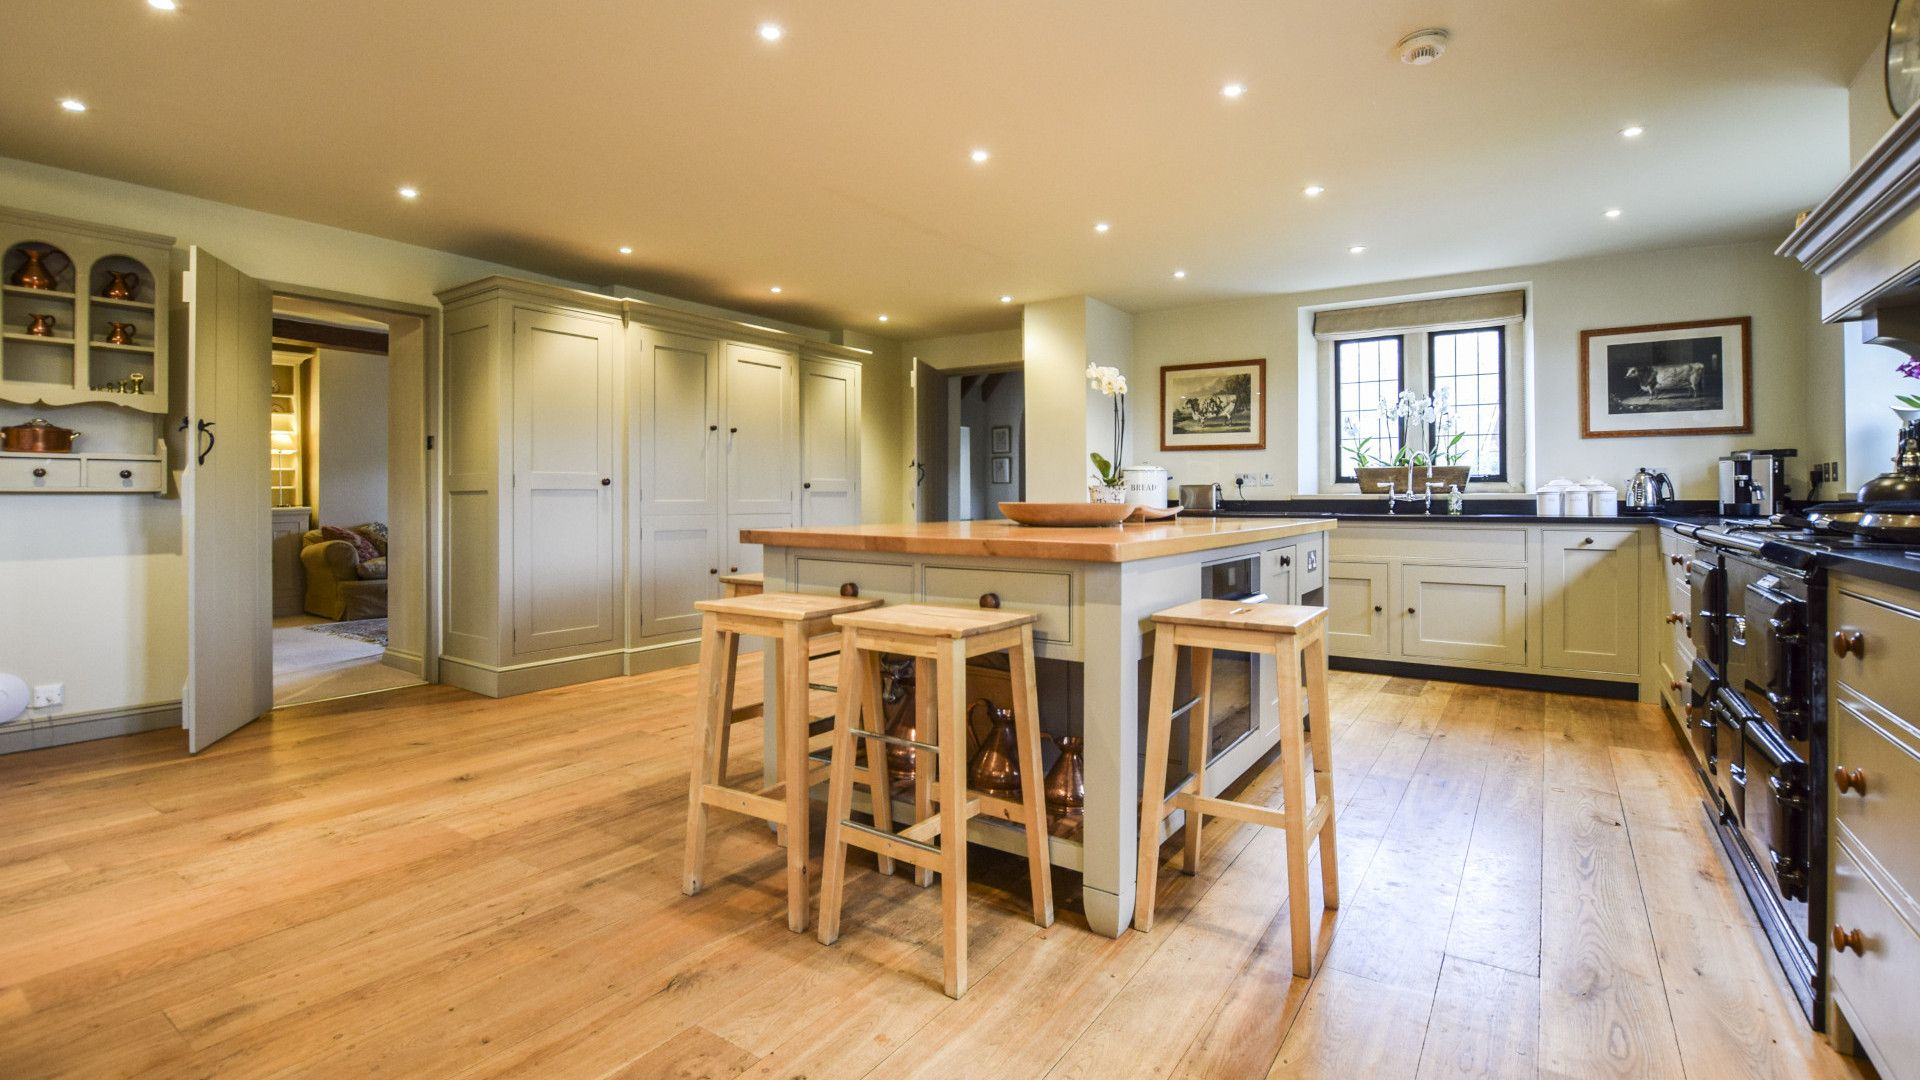 Kitchen, Grindstone Mill, Bolthole Retreats